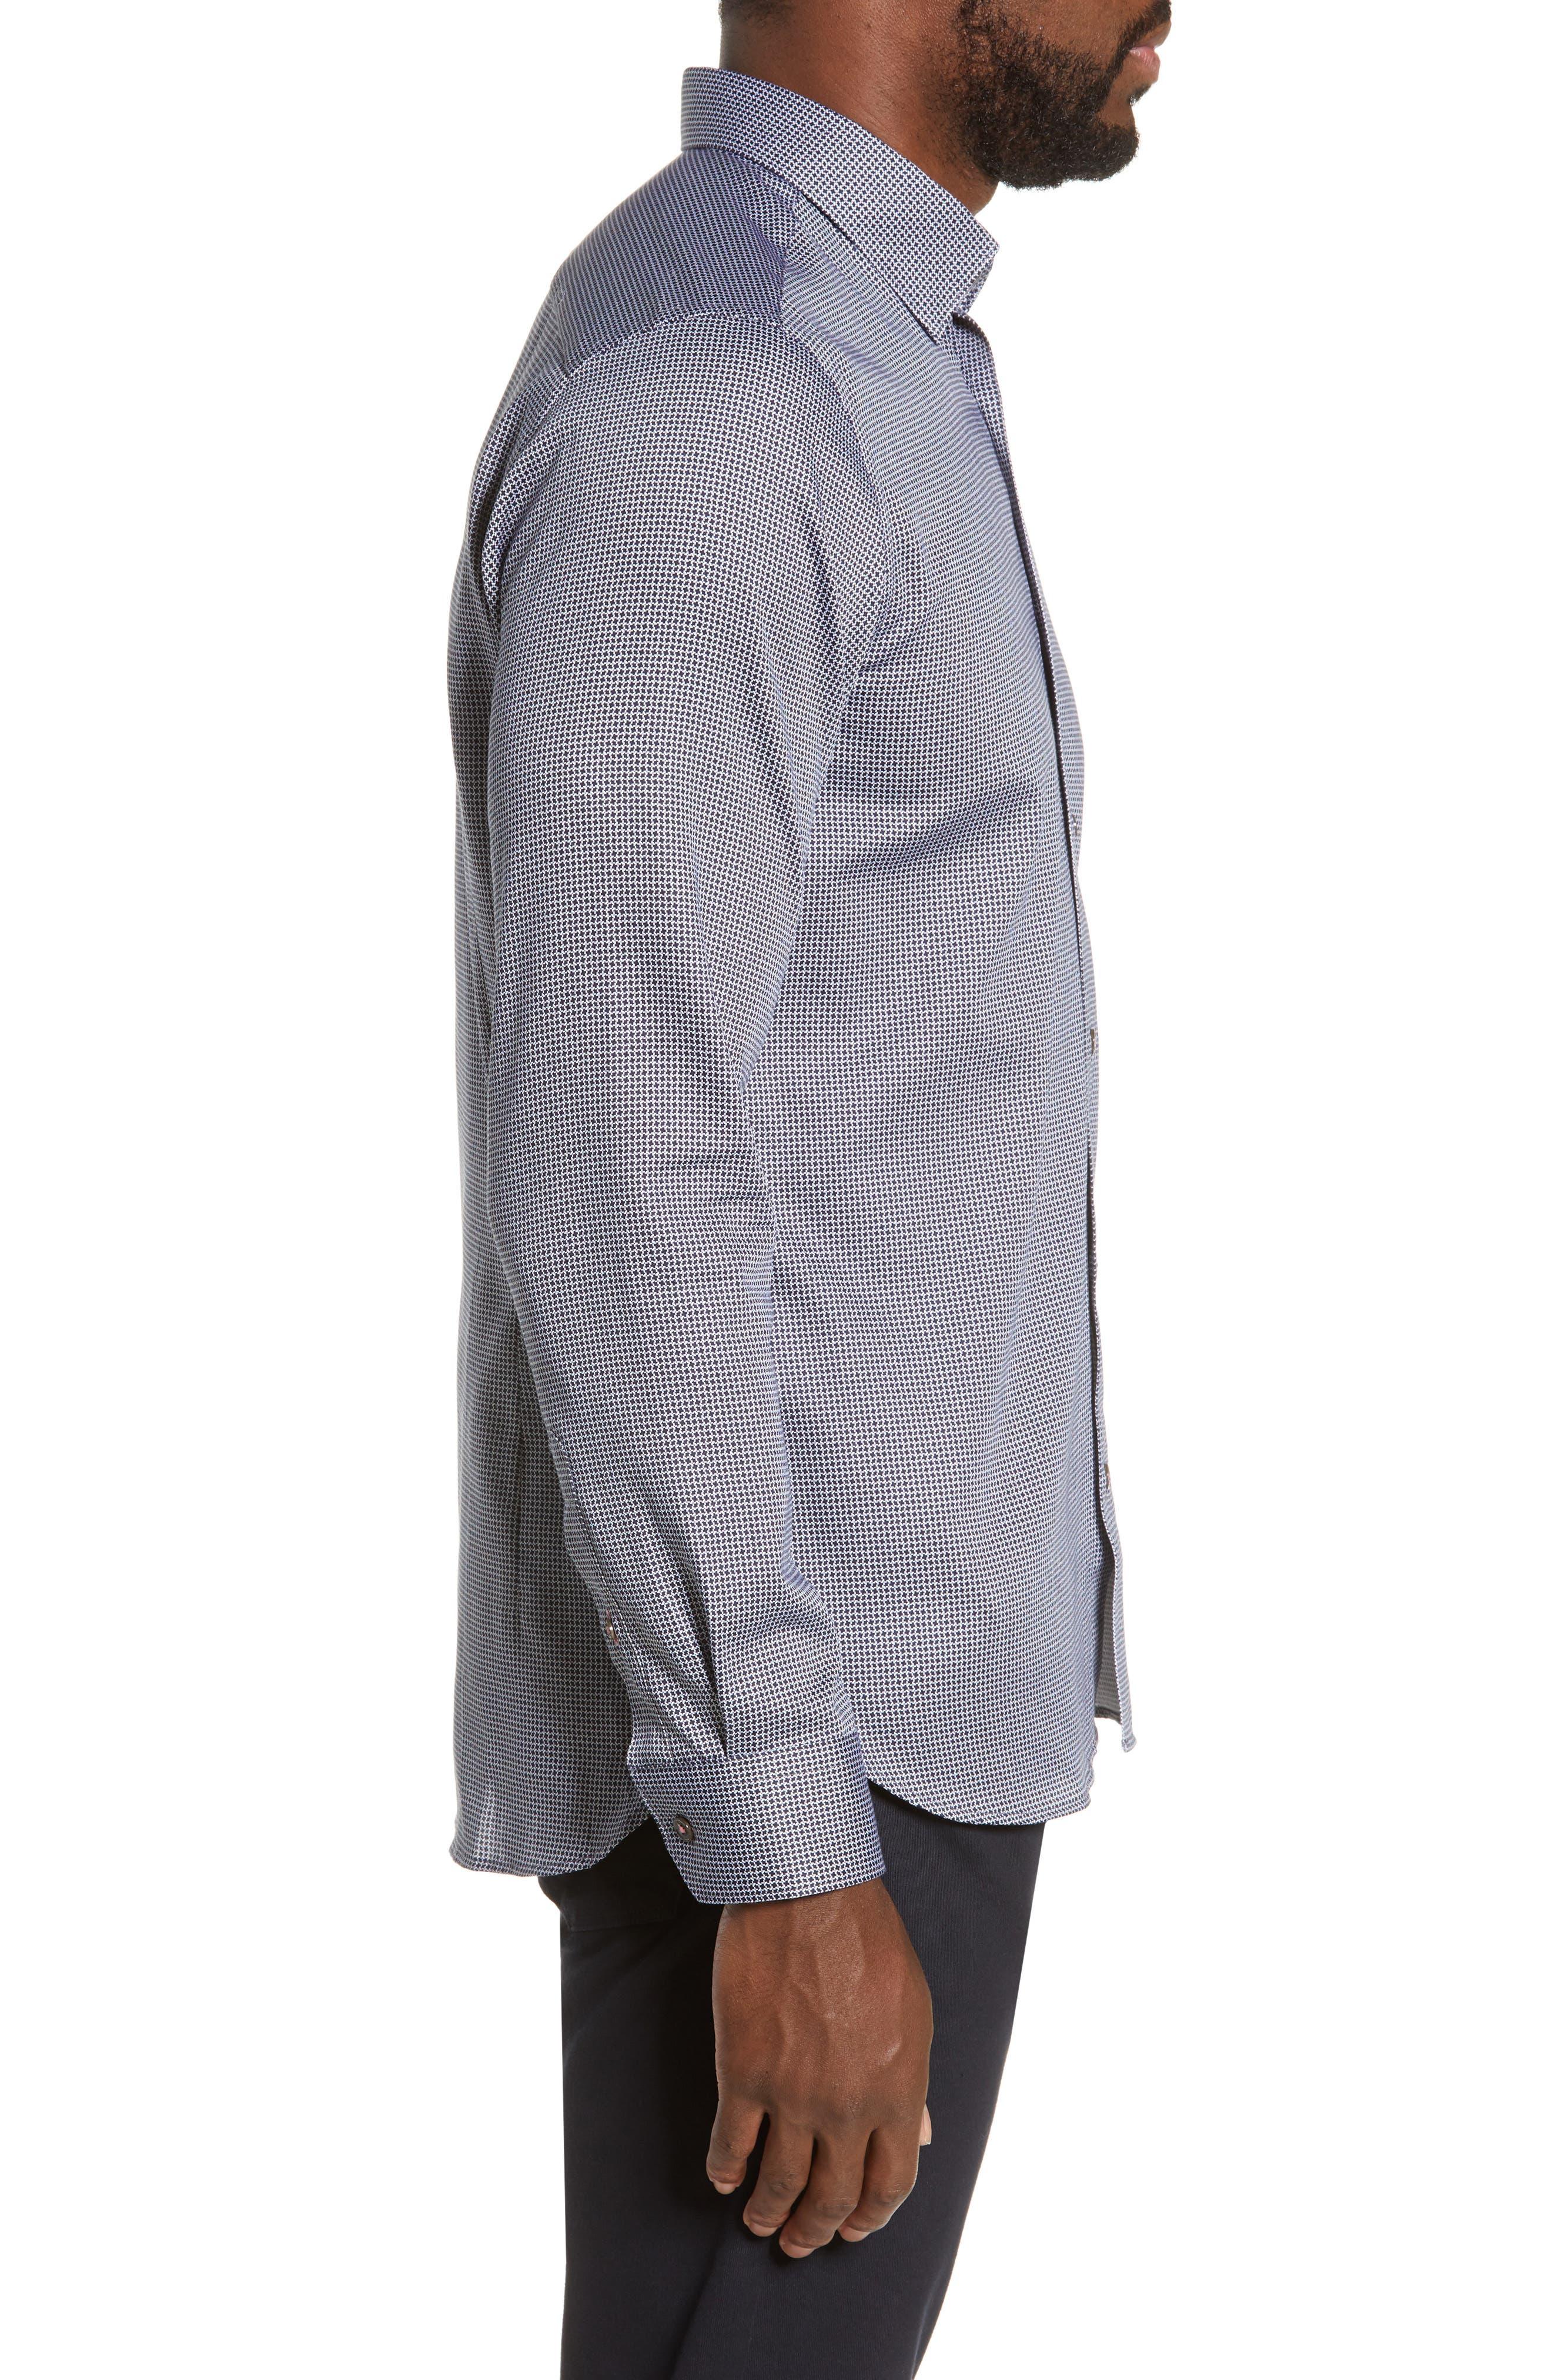 TED BAKER LONDON, Bloosem Slim Fit Print Sport Shirt, Alternate thumbnail 4, color, NAVY